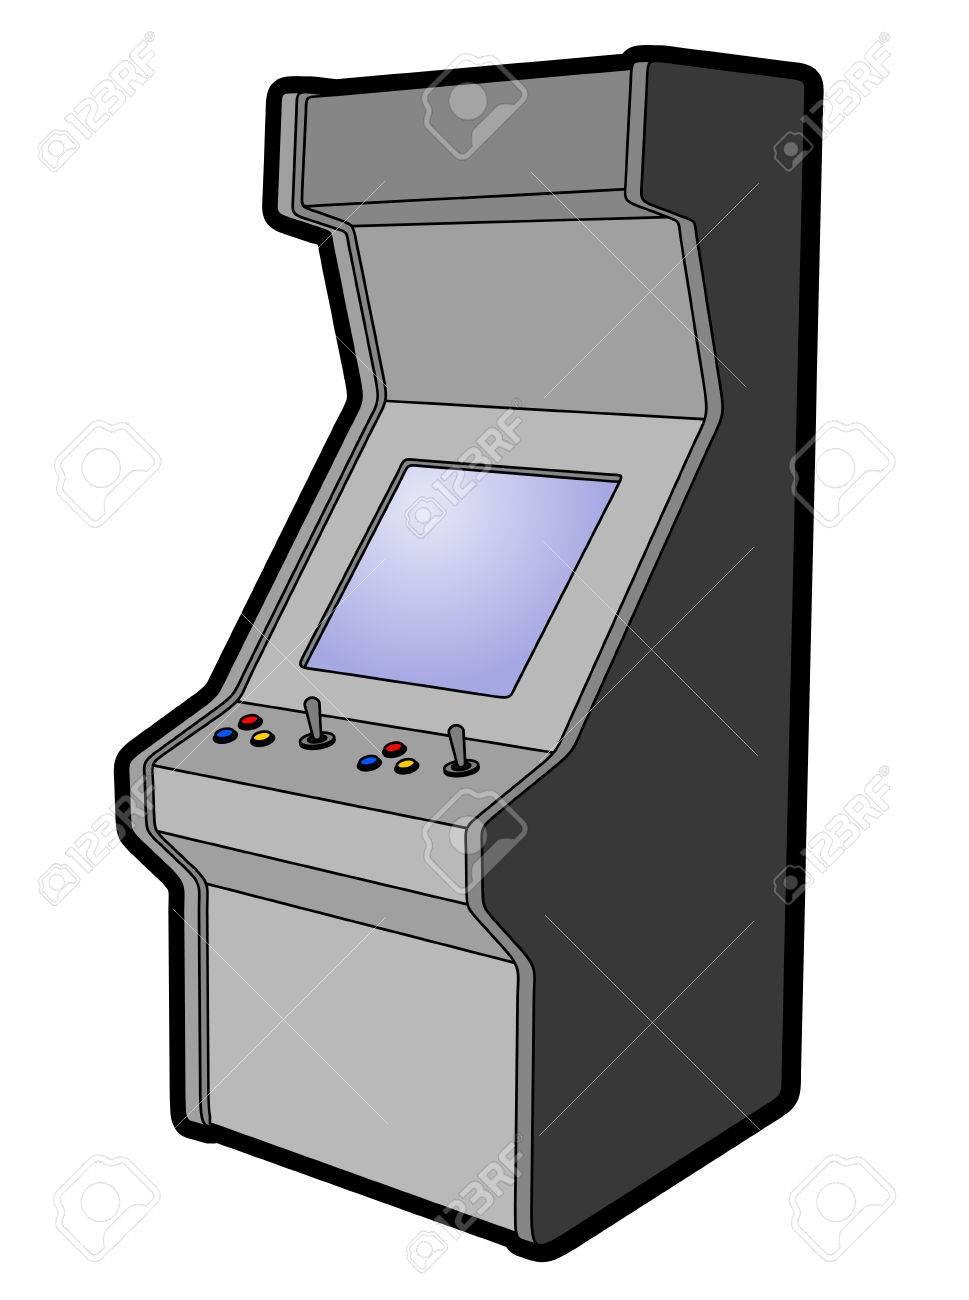 Arcade machine design.